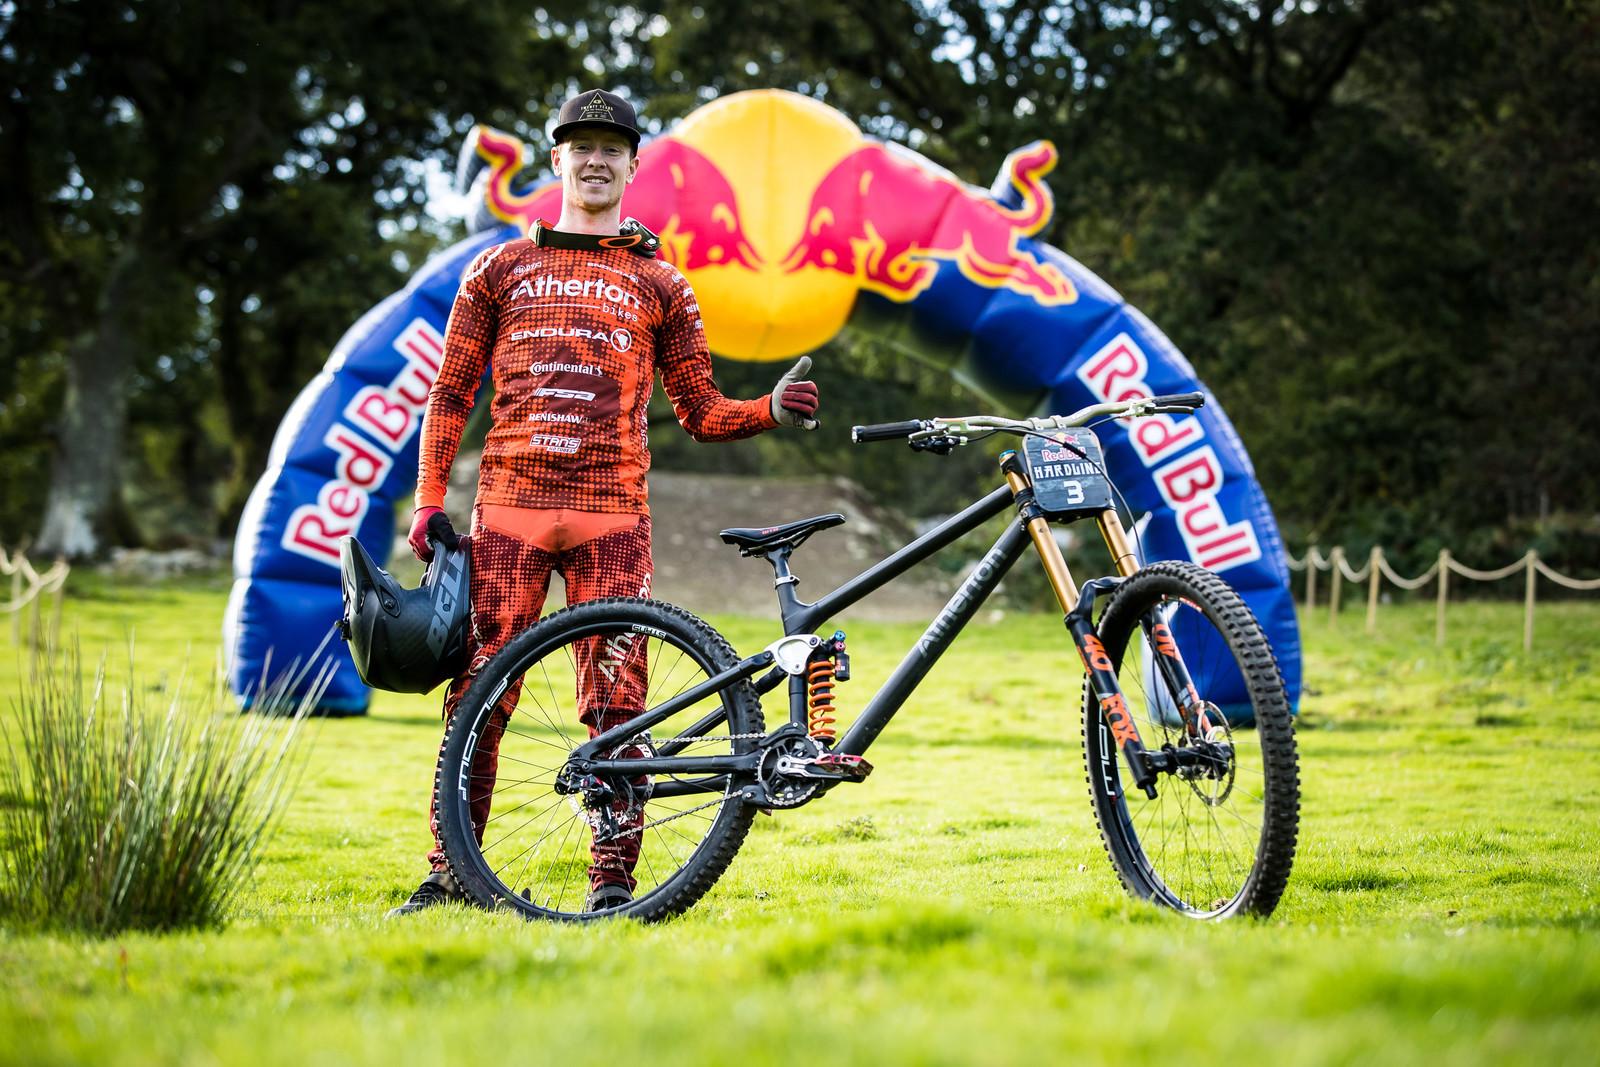 Charlie Hatton with his Atherton Bikes DH Prototype - The Bikes of Red Bull Hardline - Mountain Biking Pictures - Vital MTB